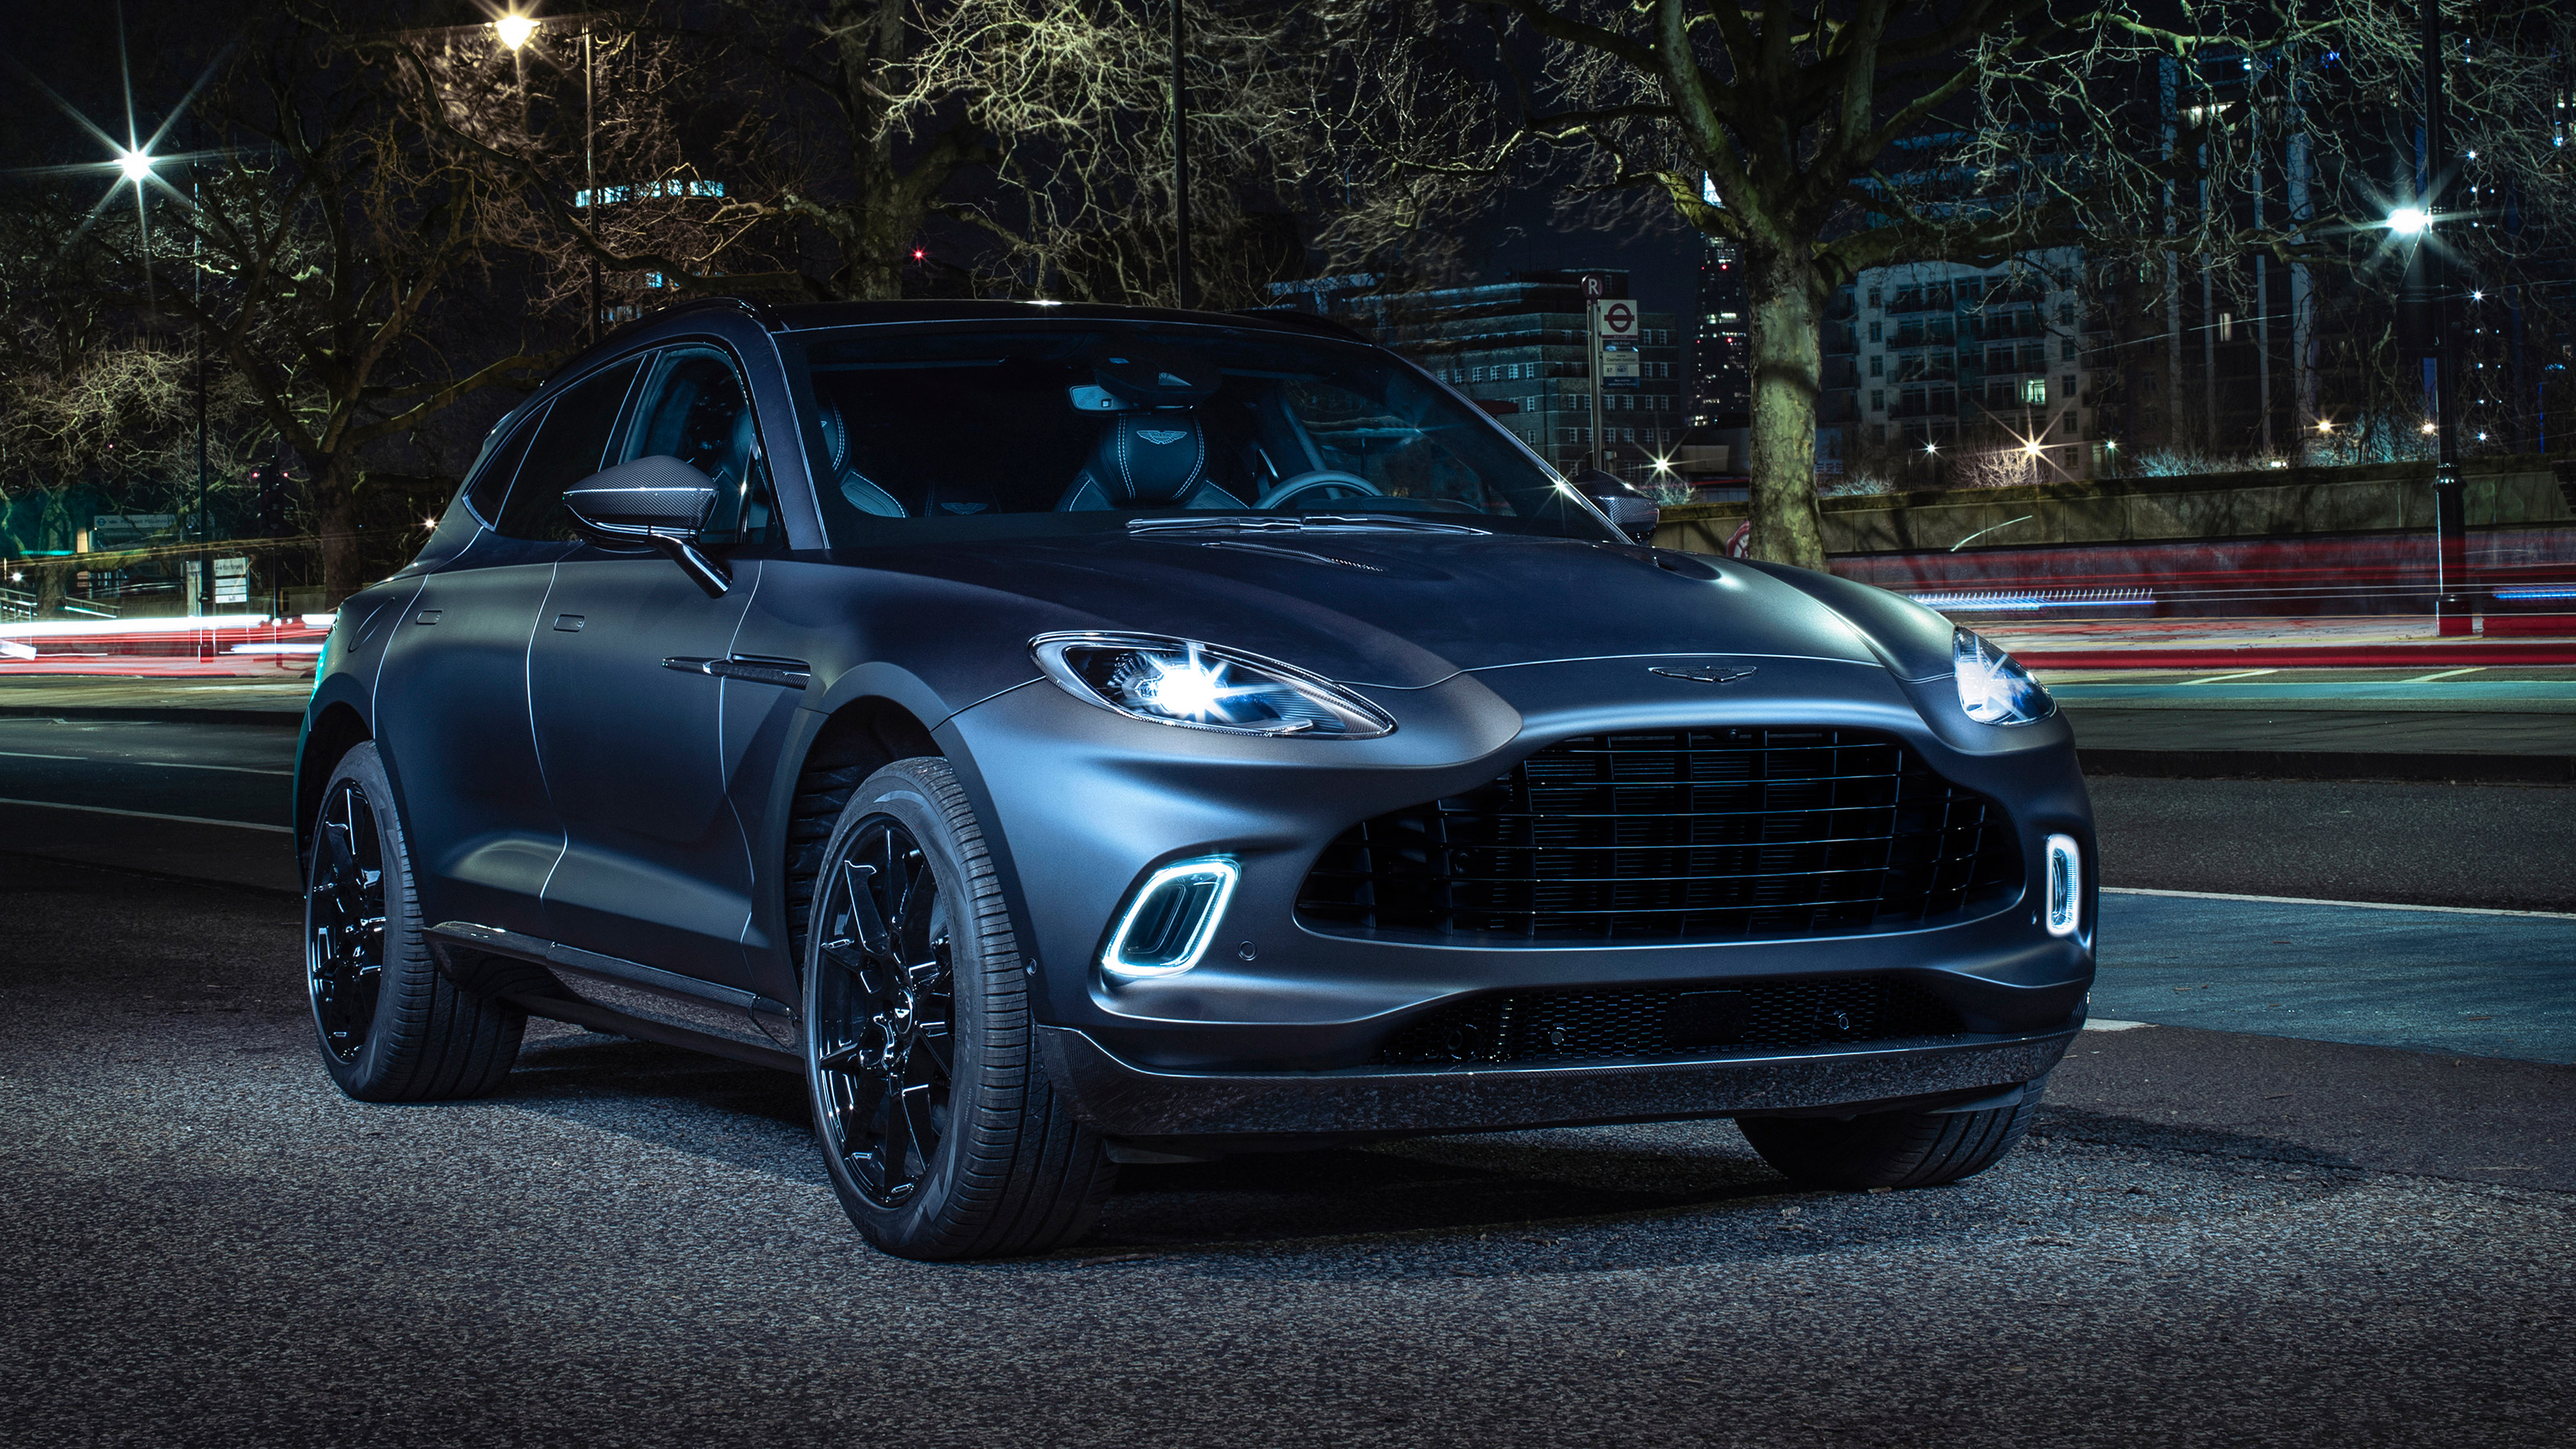 Aston Martin Dbx Unveiled With Q Customisation Evo